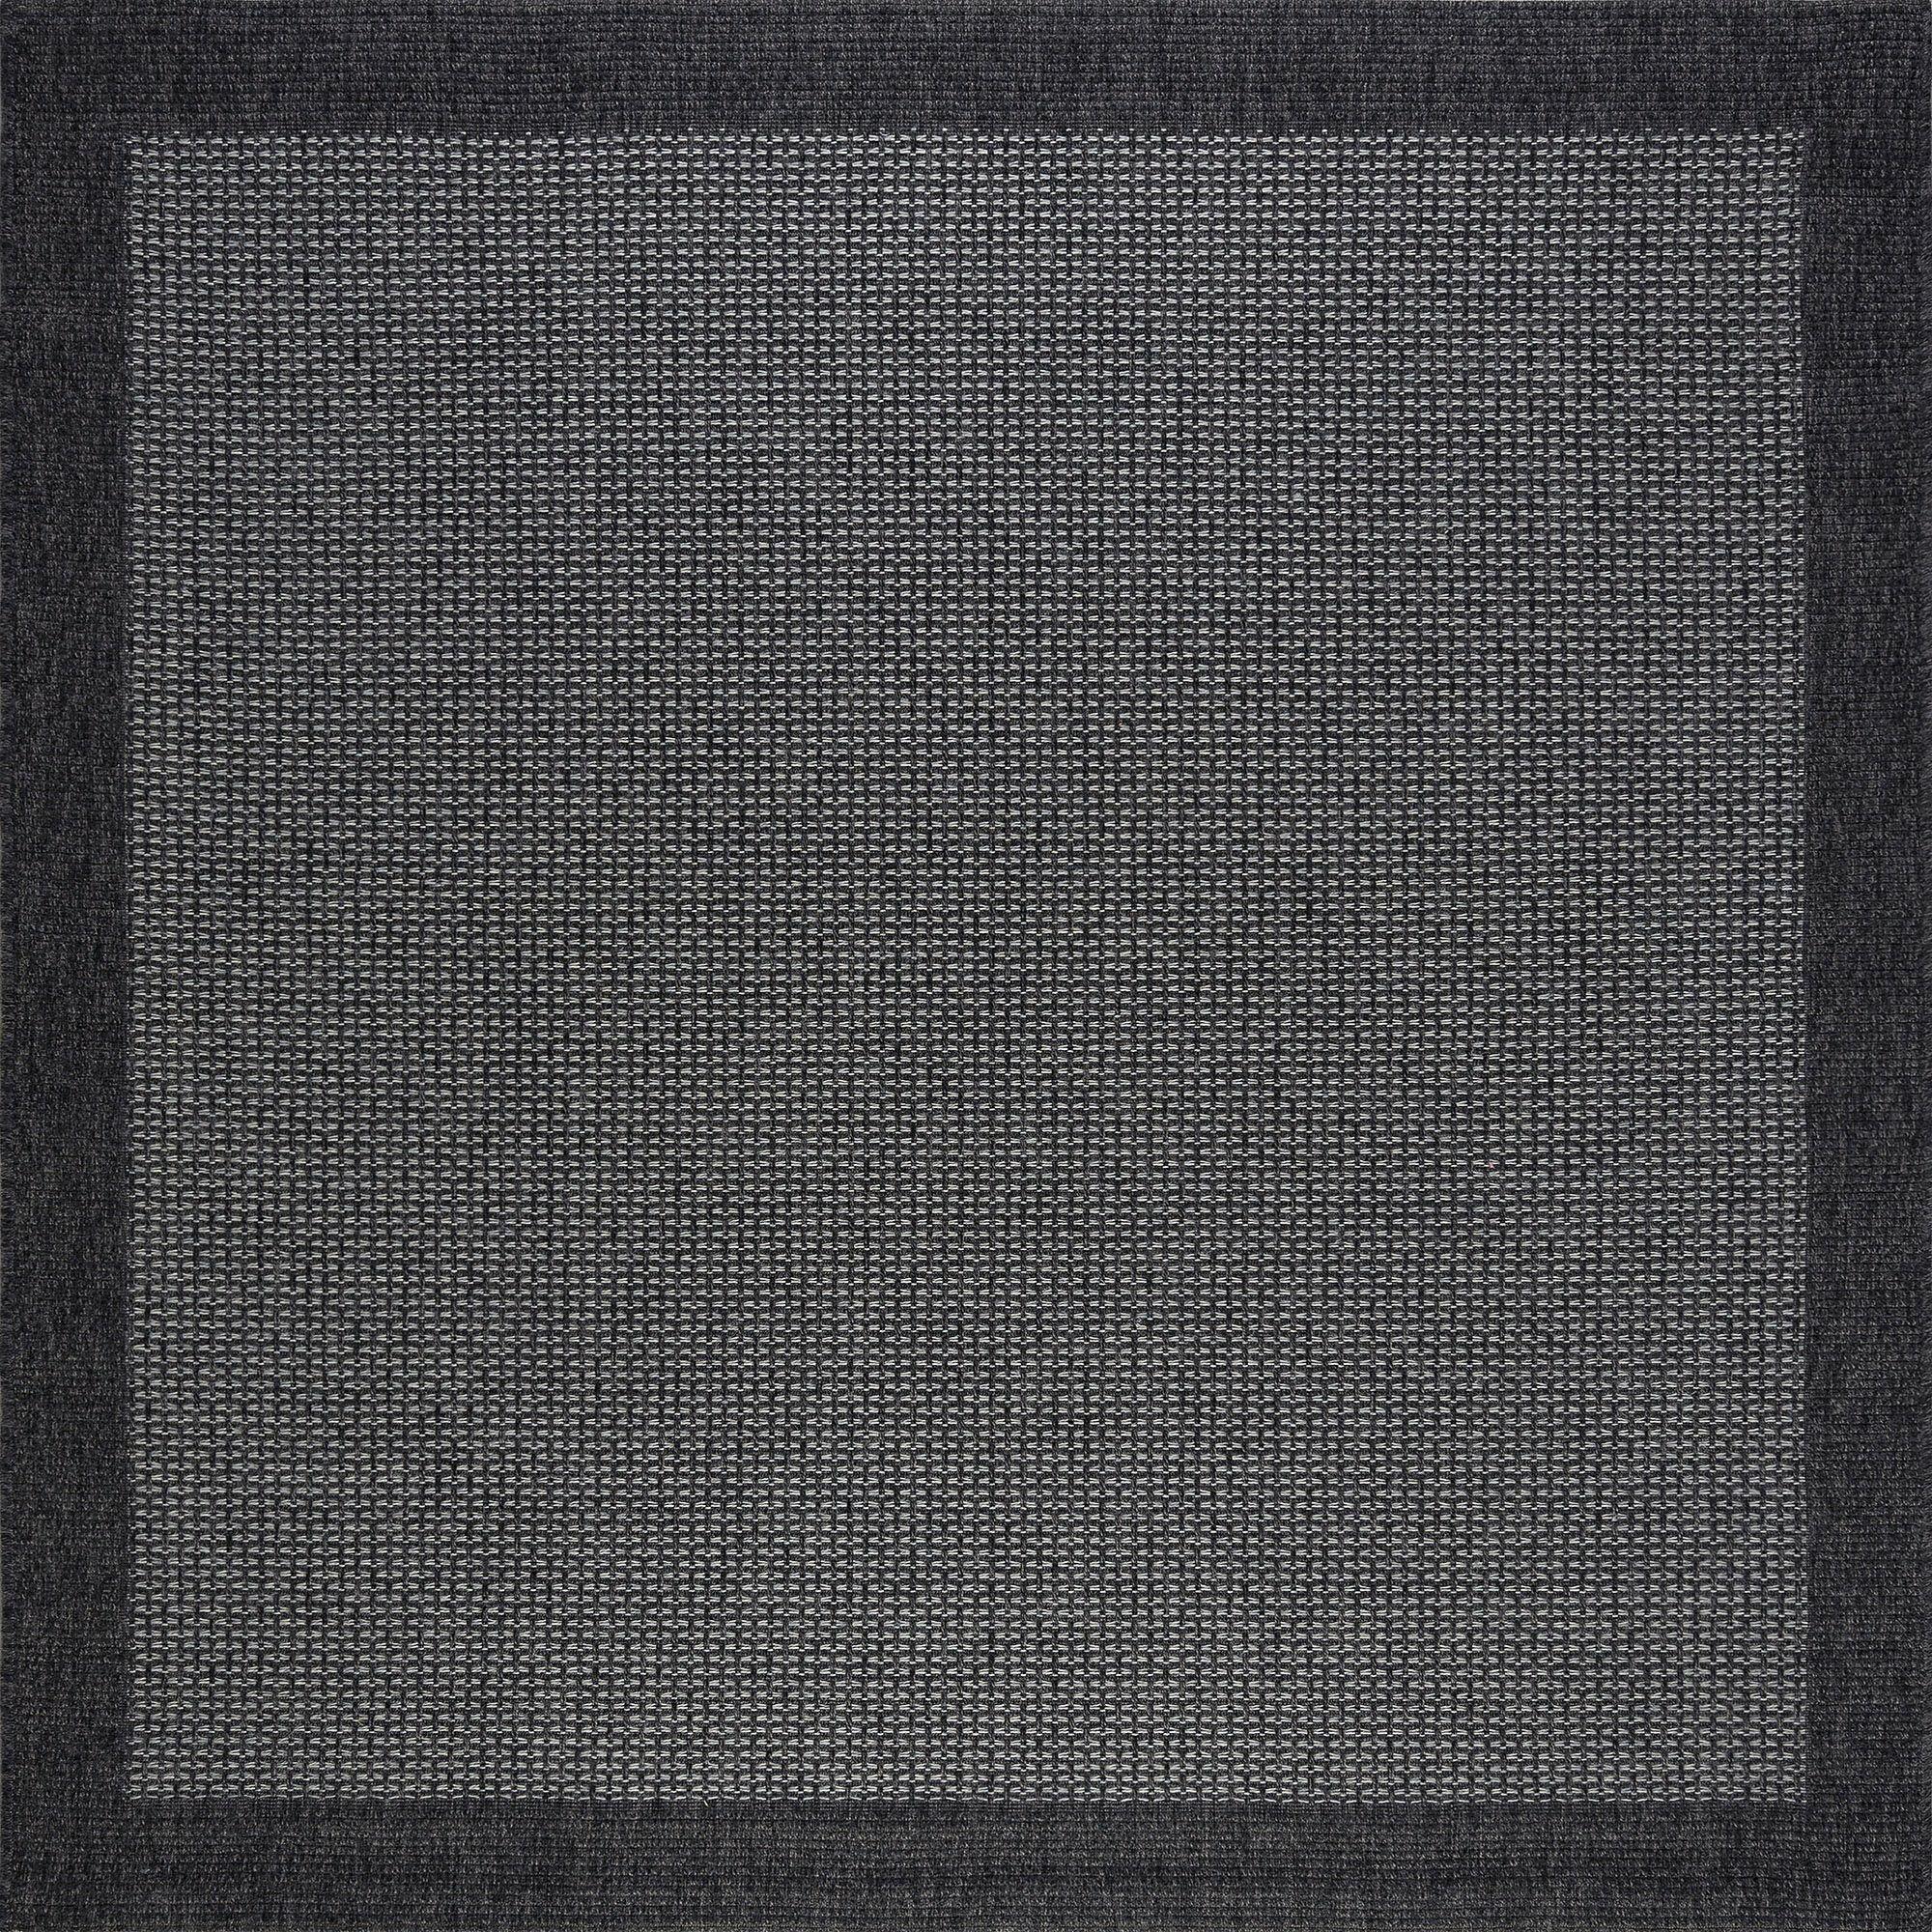 Felipe Black Indoor/Outdoor Area Rug Rug Size: Square 5'1'' x 5'2''